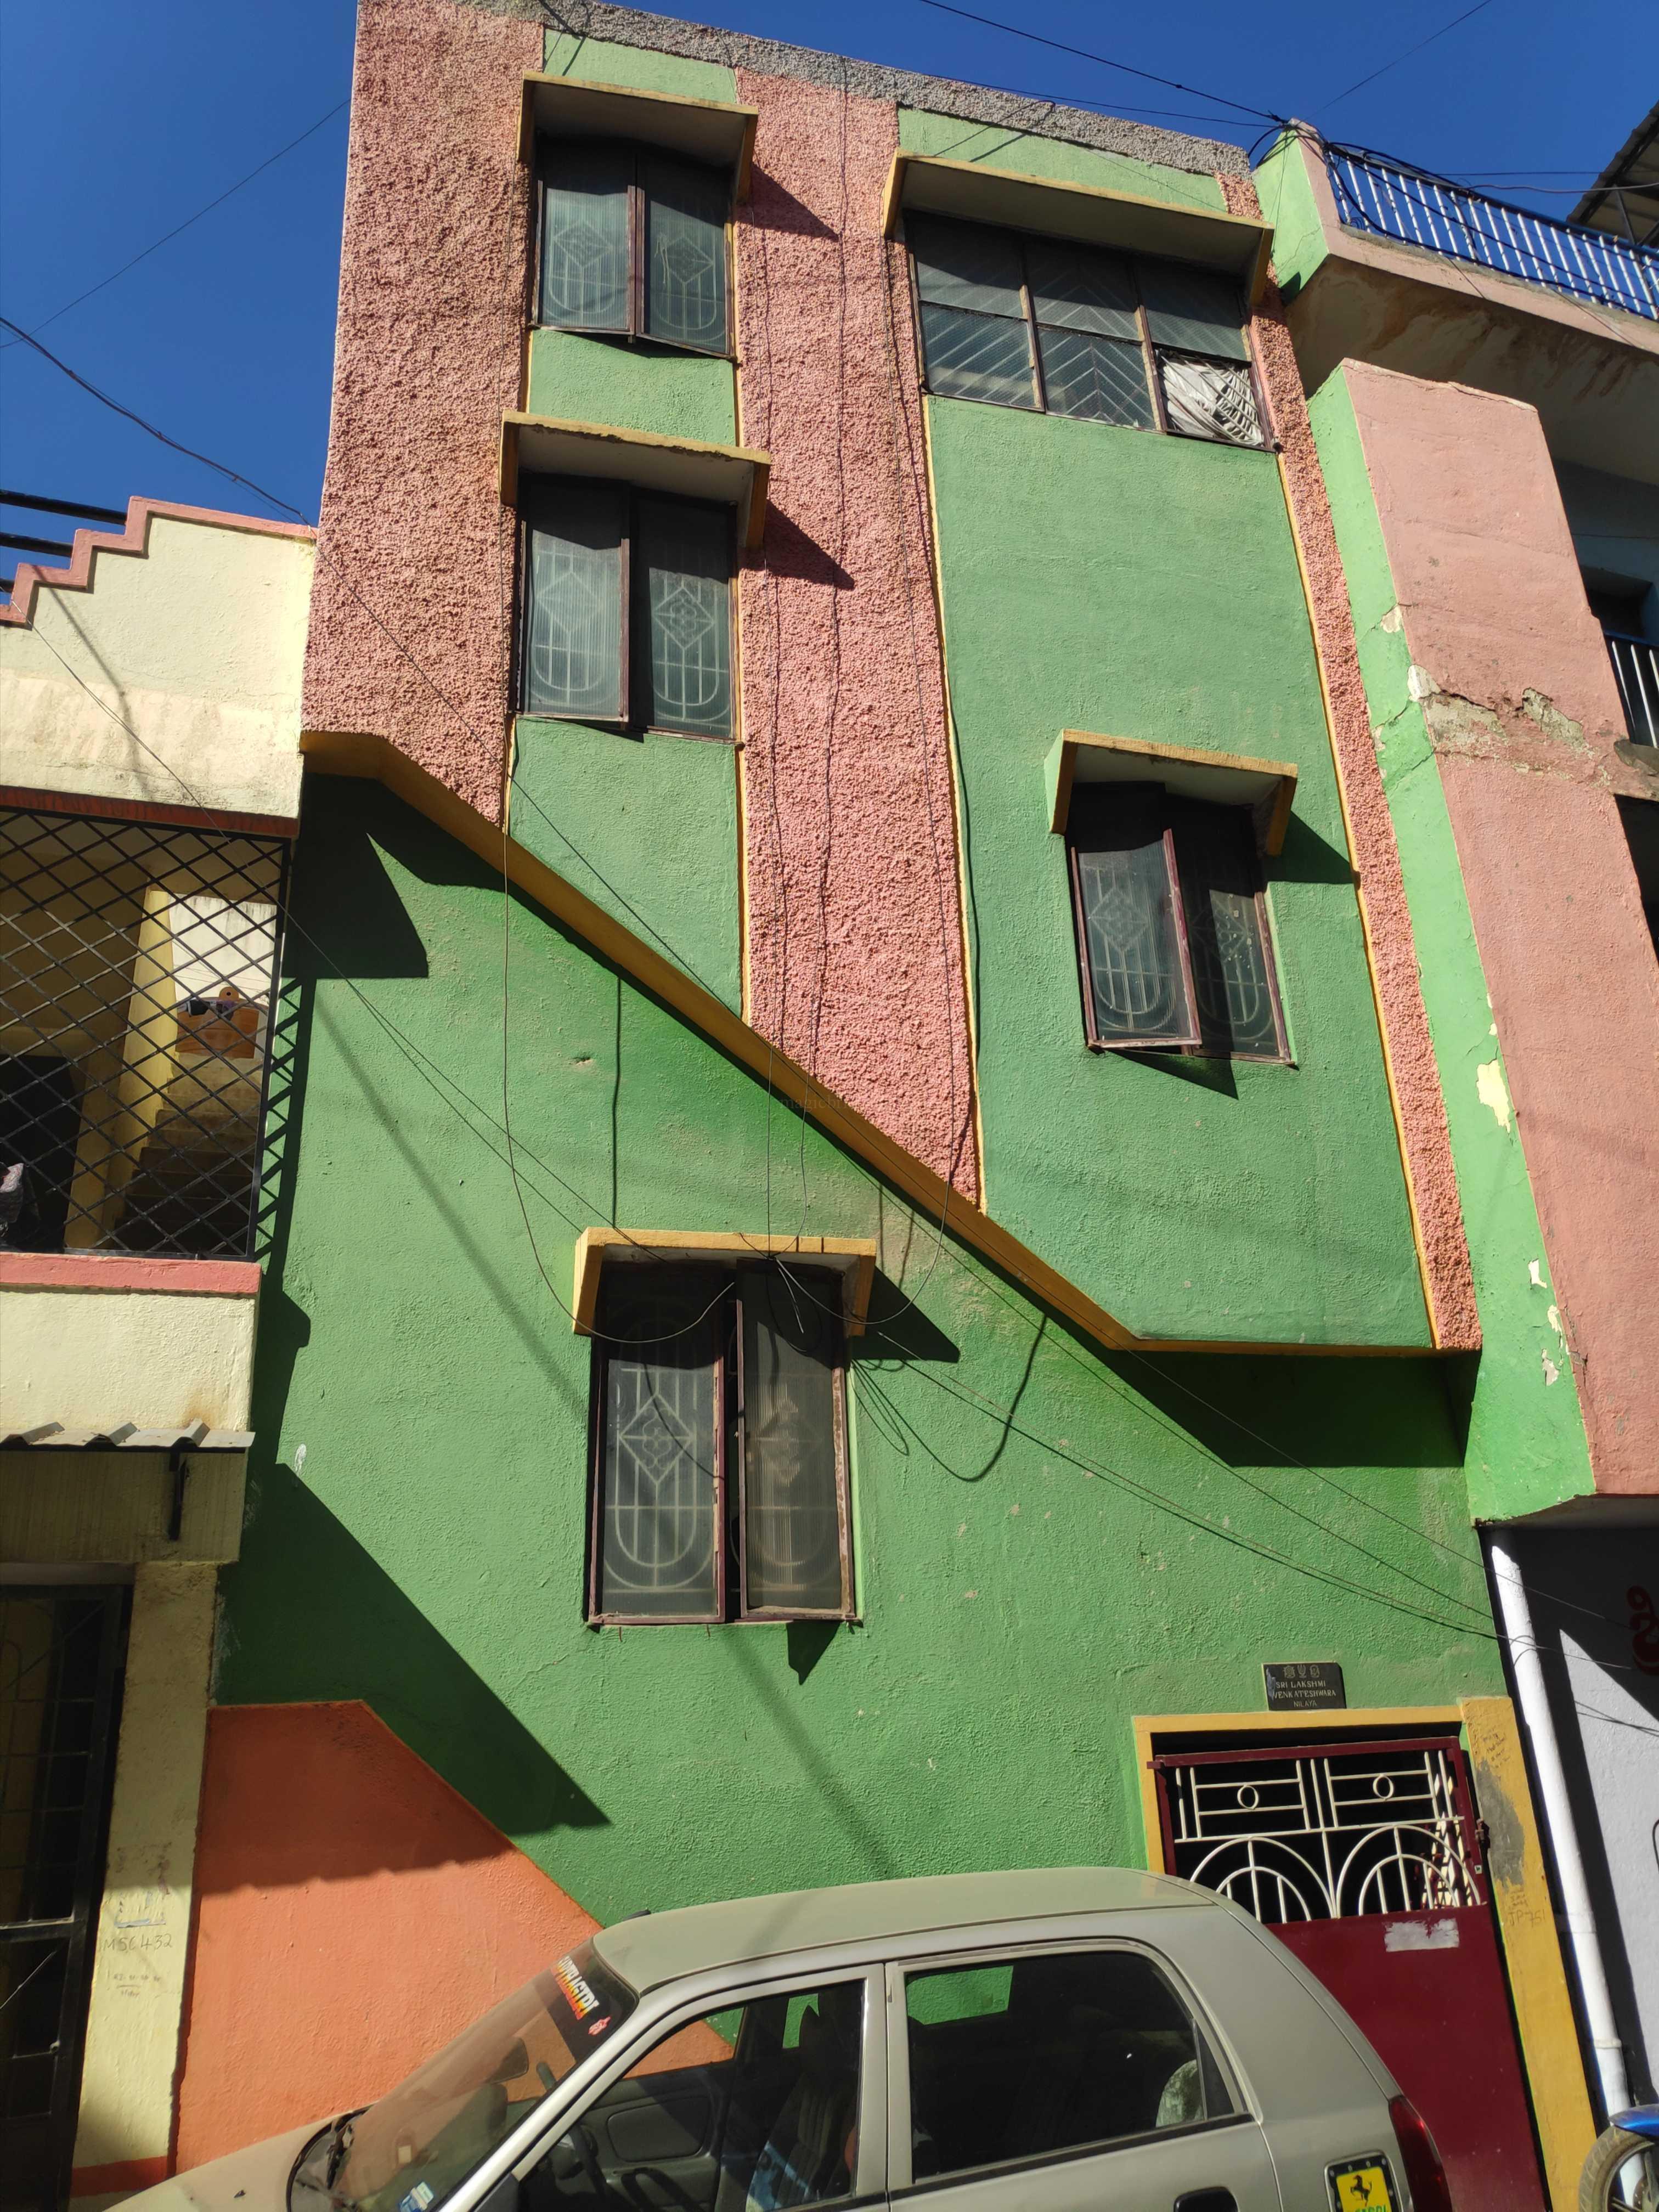 1560403565_banner_bangalore_14.jpg